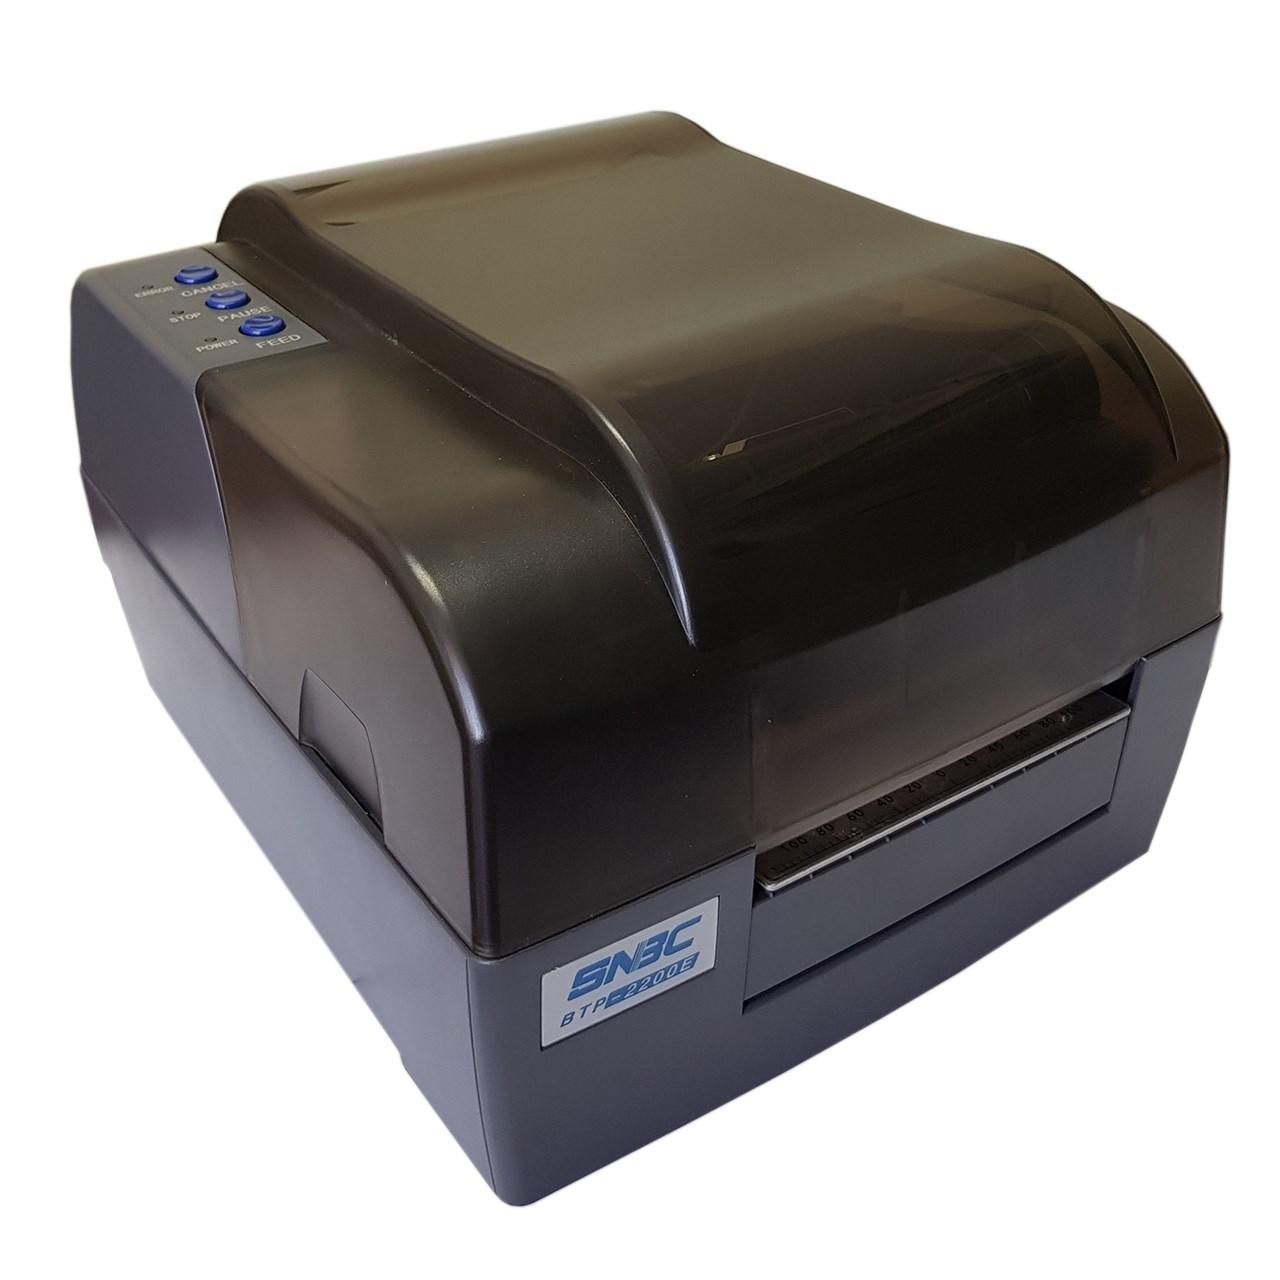 قیمت                      پرینتر لیبل زن اس ان بی سی مدل BTP-2200E